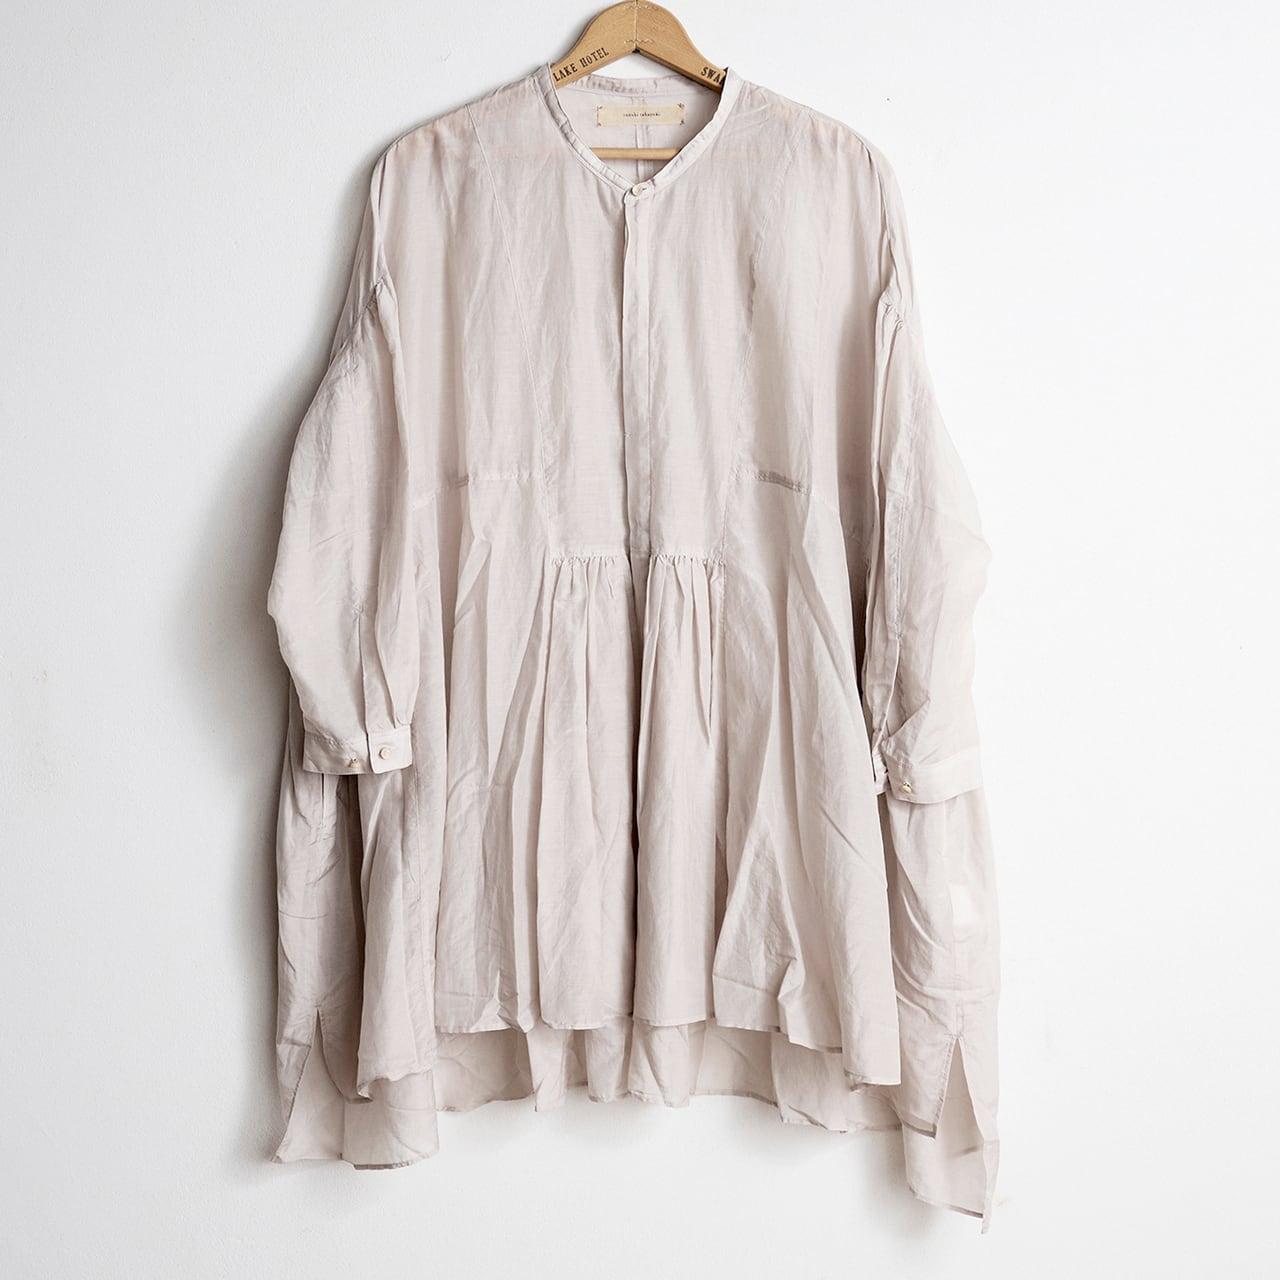 suzuki takayuki スズキタカユキ broad blouse ice grey